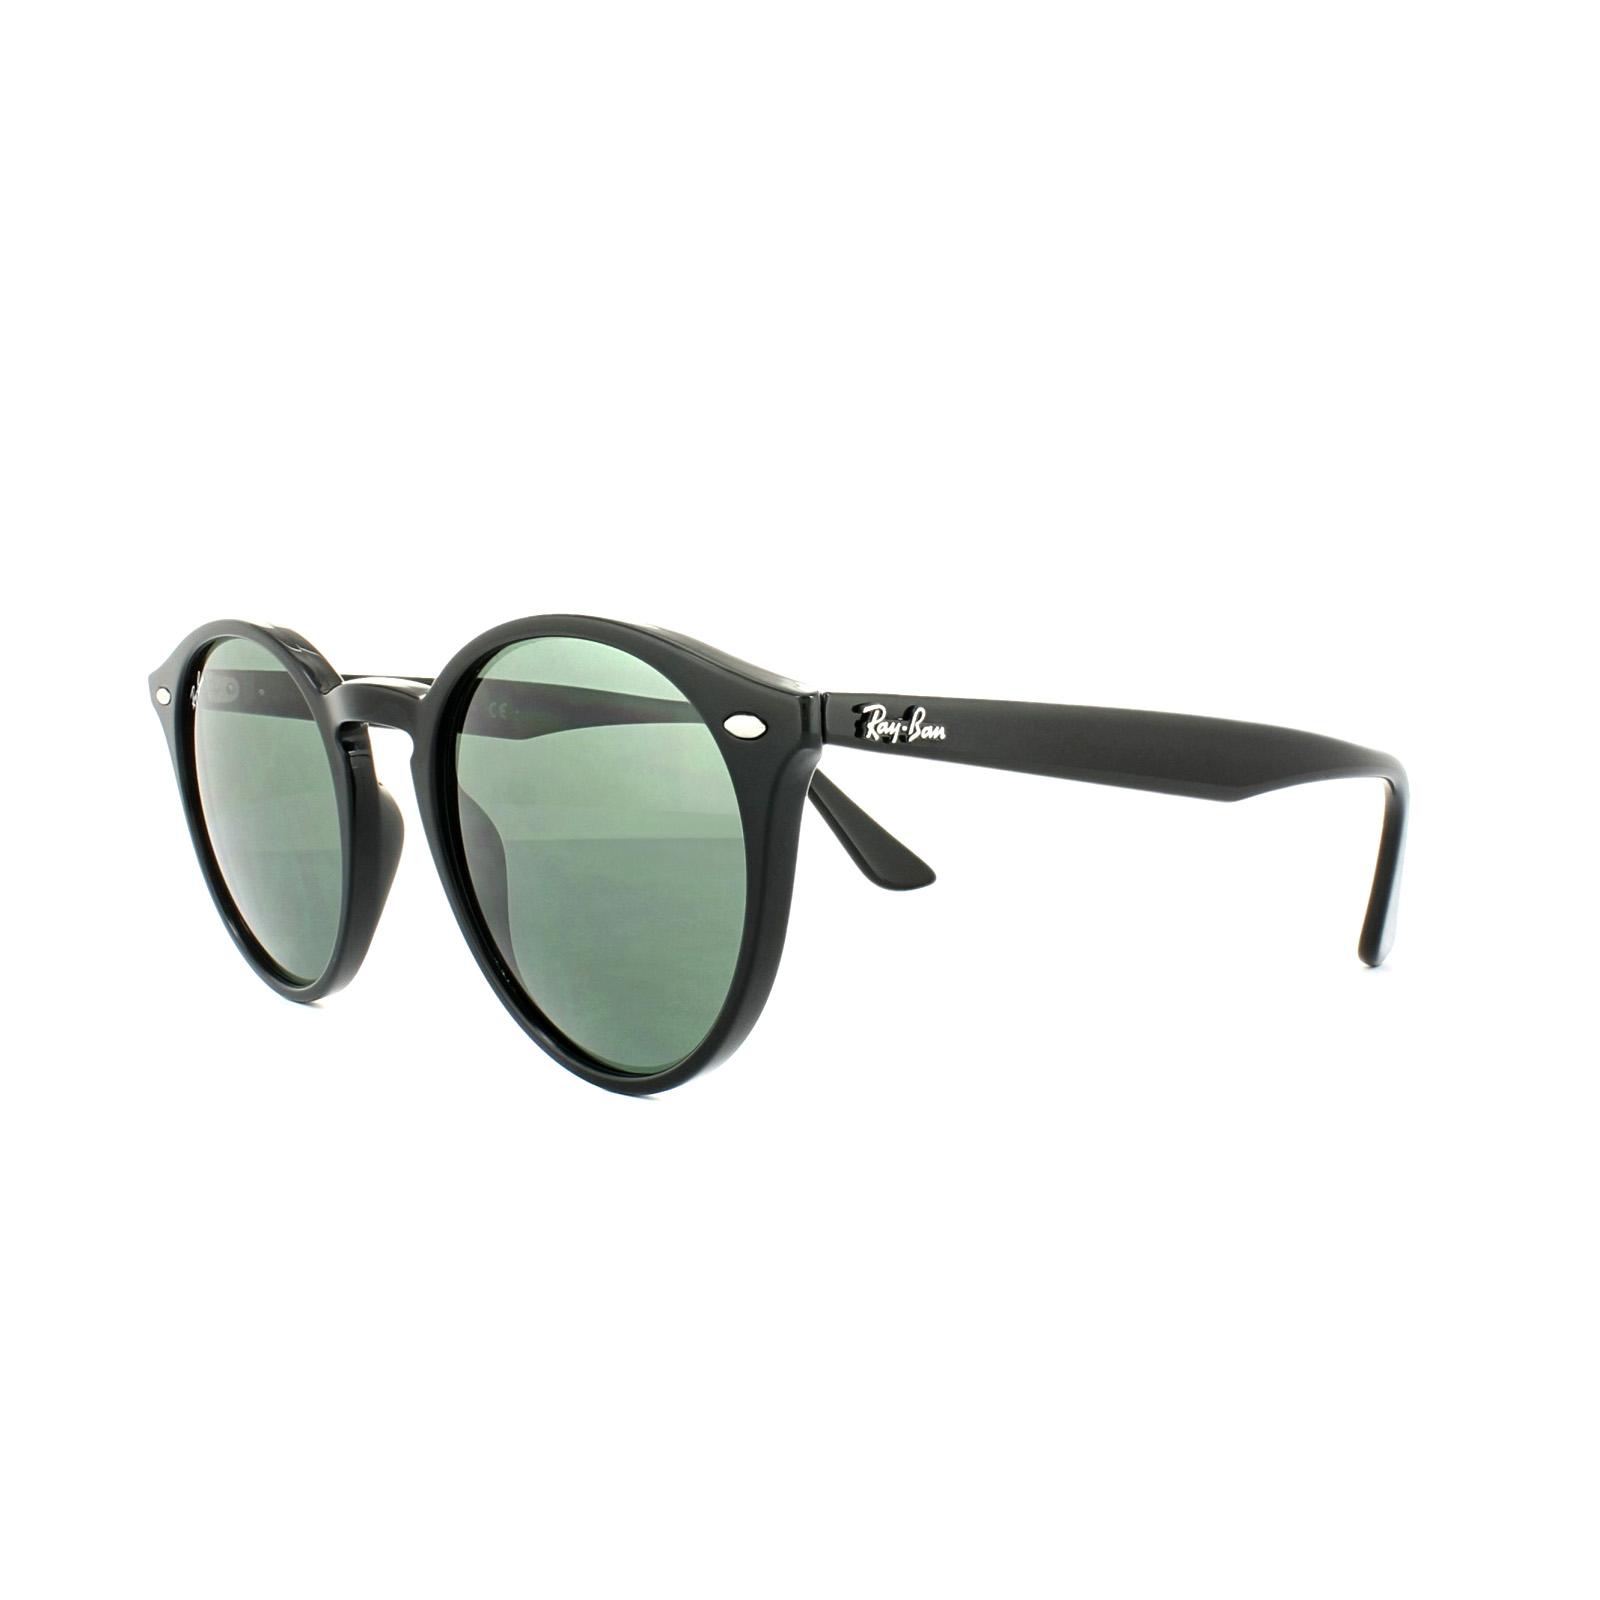 76e3905fe6670a Ray-Ban Sunglasses 2180 601 71 Black Green 51mm 8053672546941